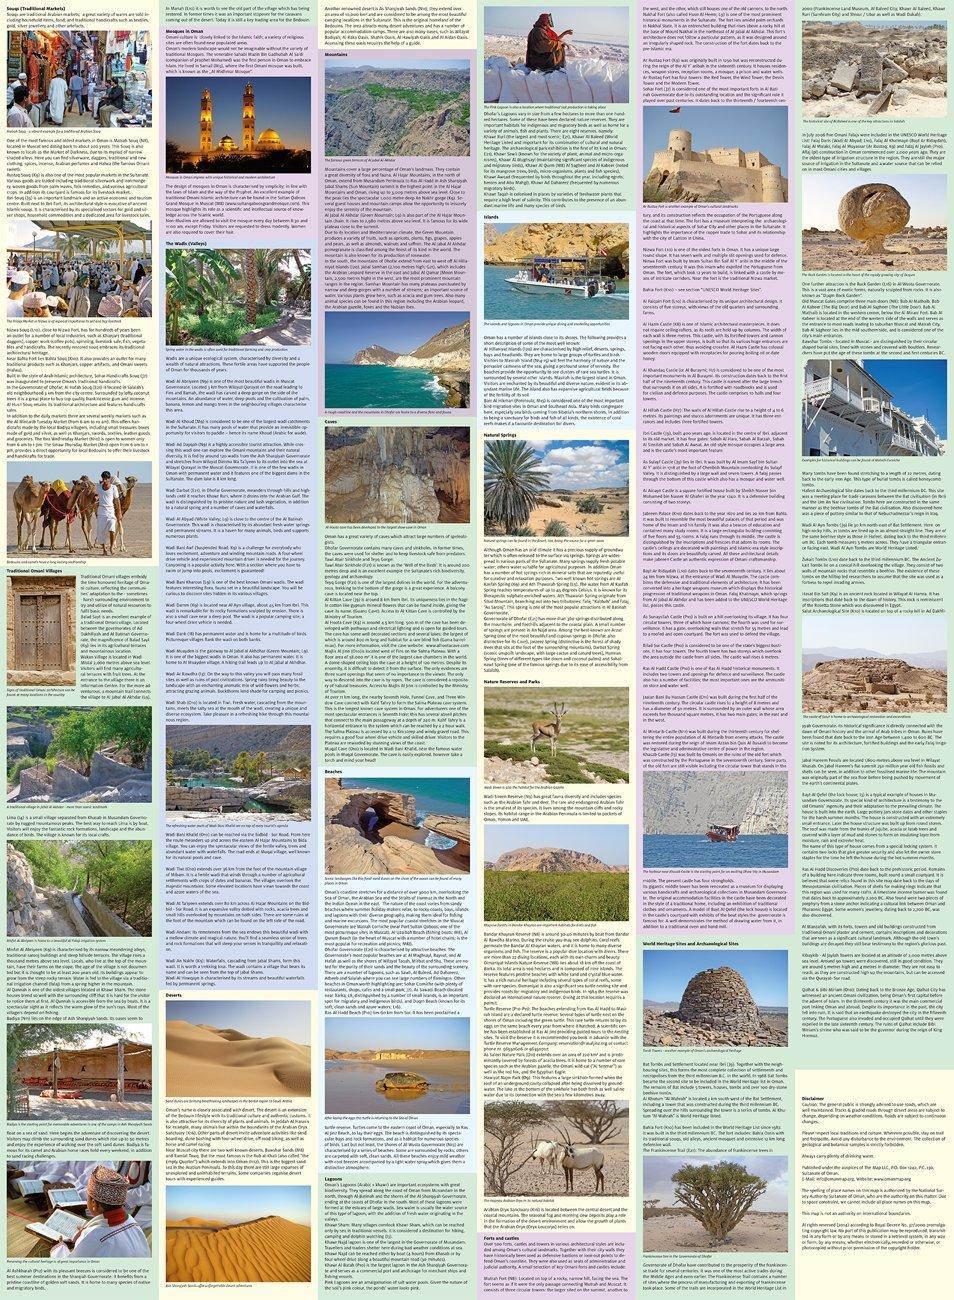 Karte Oman.Sultanate Of Oman Tourist Map Amazon De The Map Llc Oman Intewo